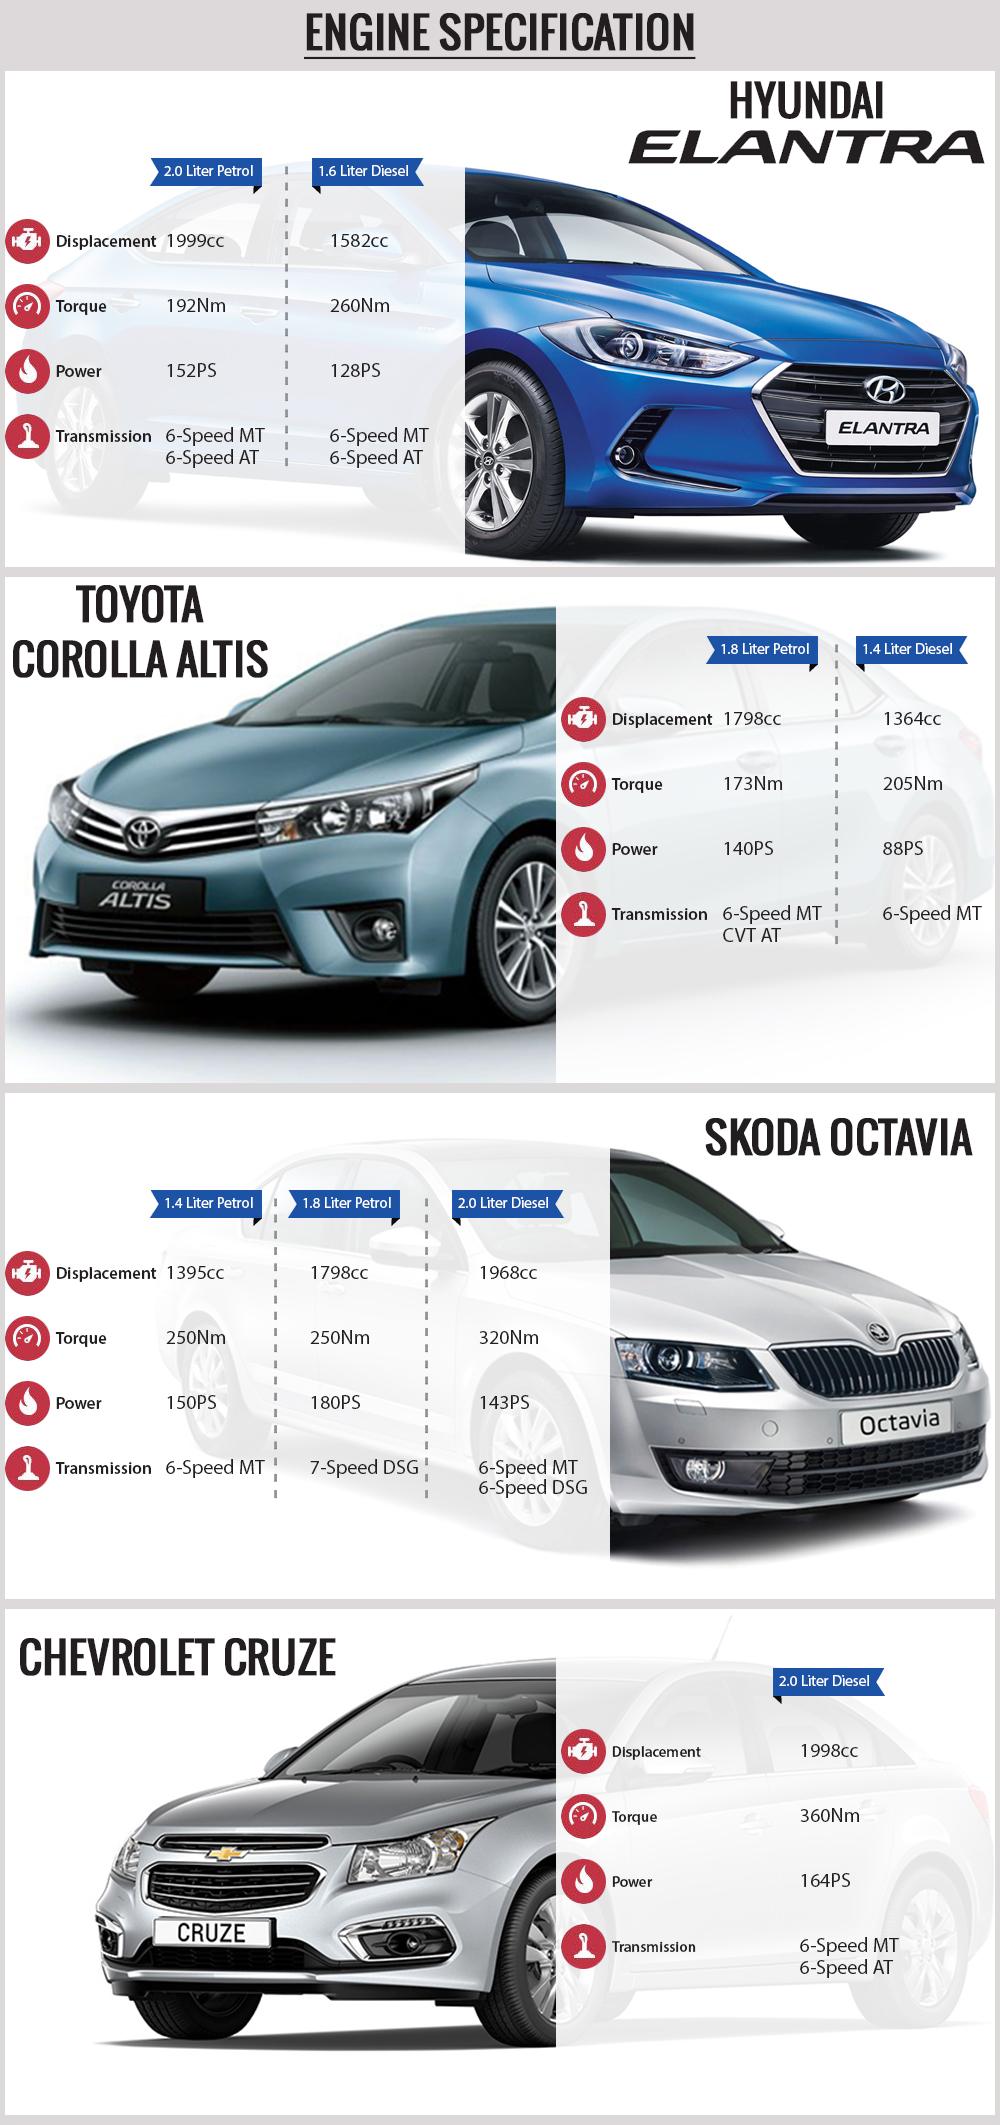 New Hyundai Elantra vs Toyota Corolla Altis vs Skoda Octavia vs Chevrolet Cruze Engine Specs